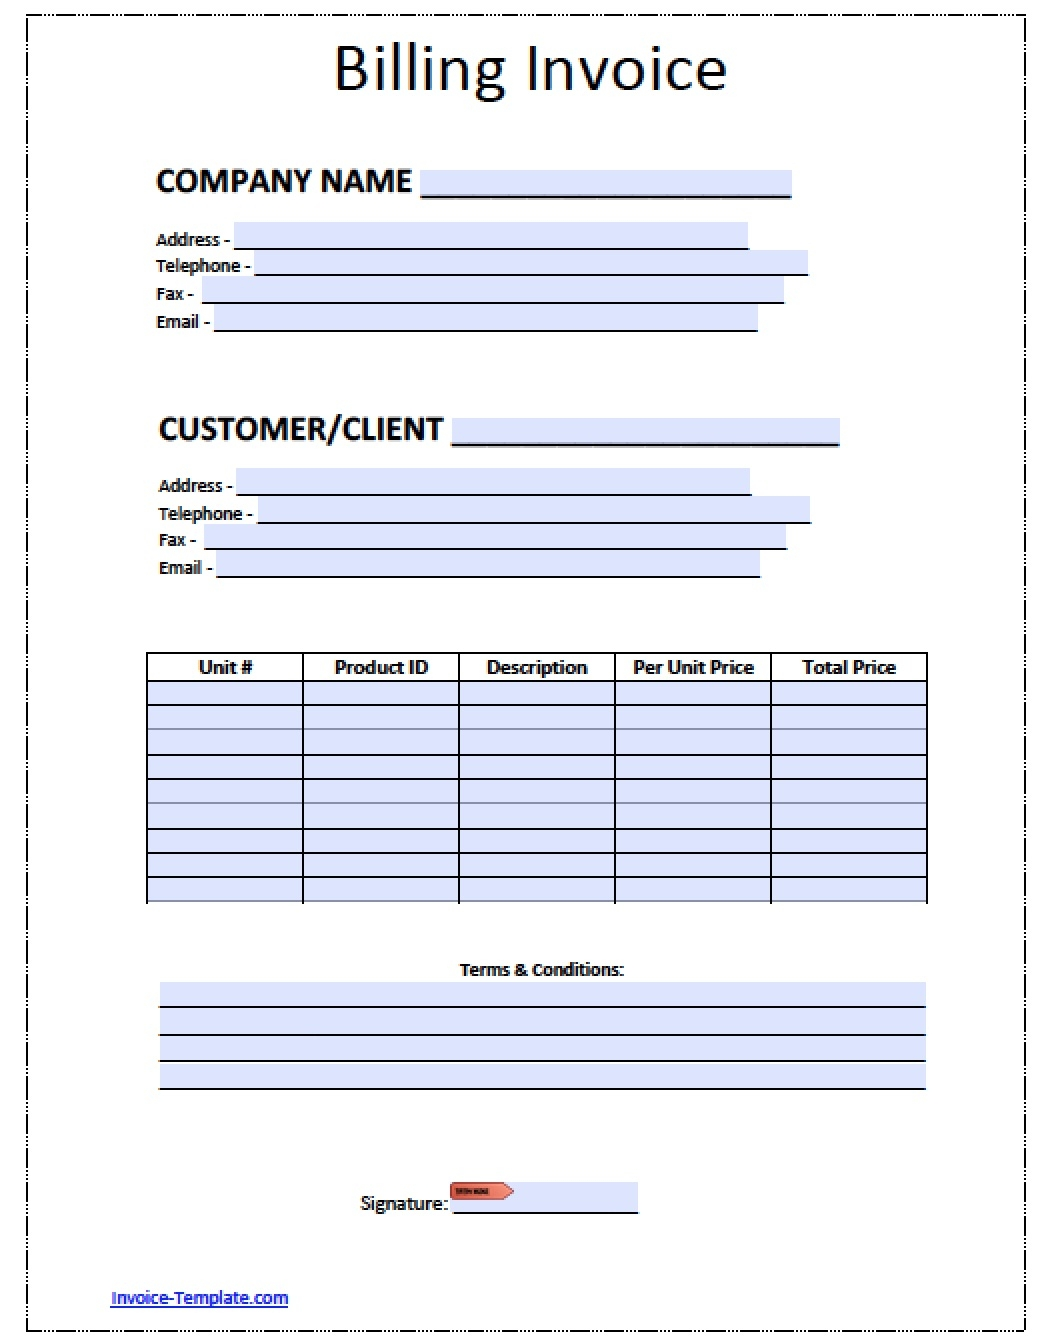 Google Templates Invoice Excel Download Ebay Invoice Template  Rabitahnet Best Invoice with Factoring Invoice Ebay Invoice Example  Invoice Template Ideas Simple Invoice Sample Invoice Free Word